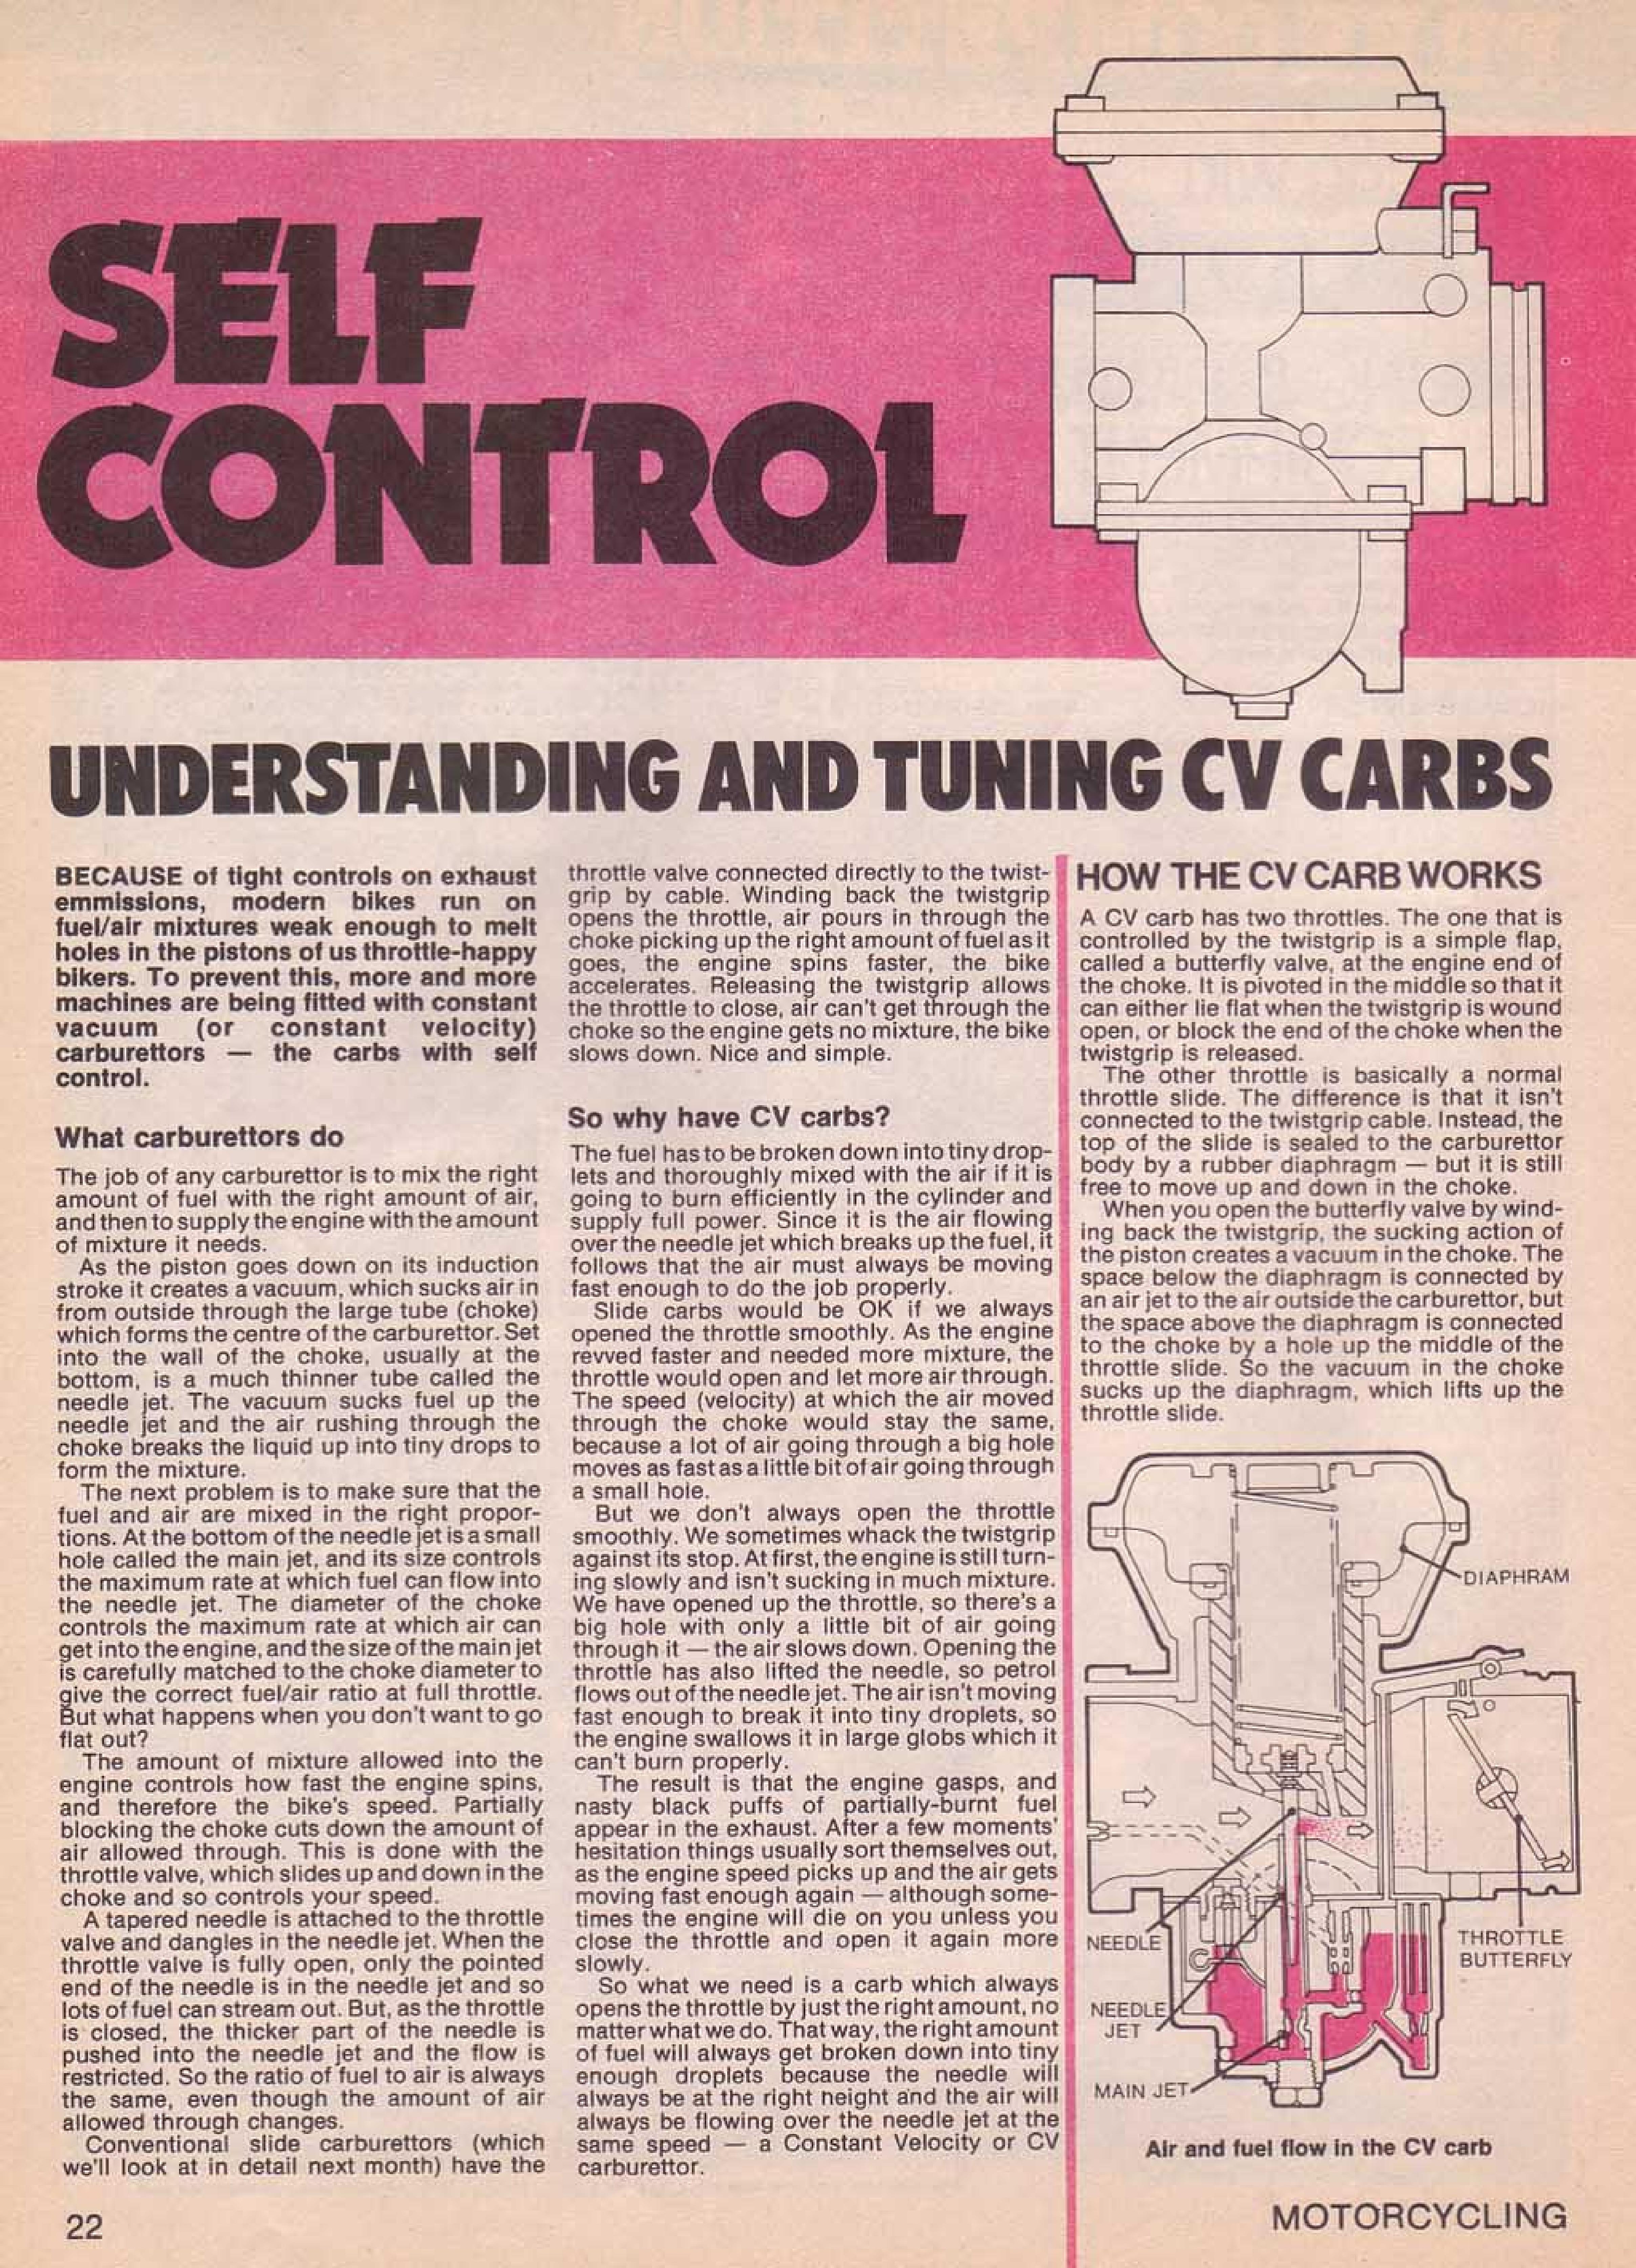 Motorcycling Magazine about CV Carburetors (July 1979)